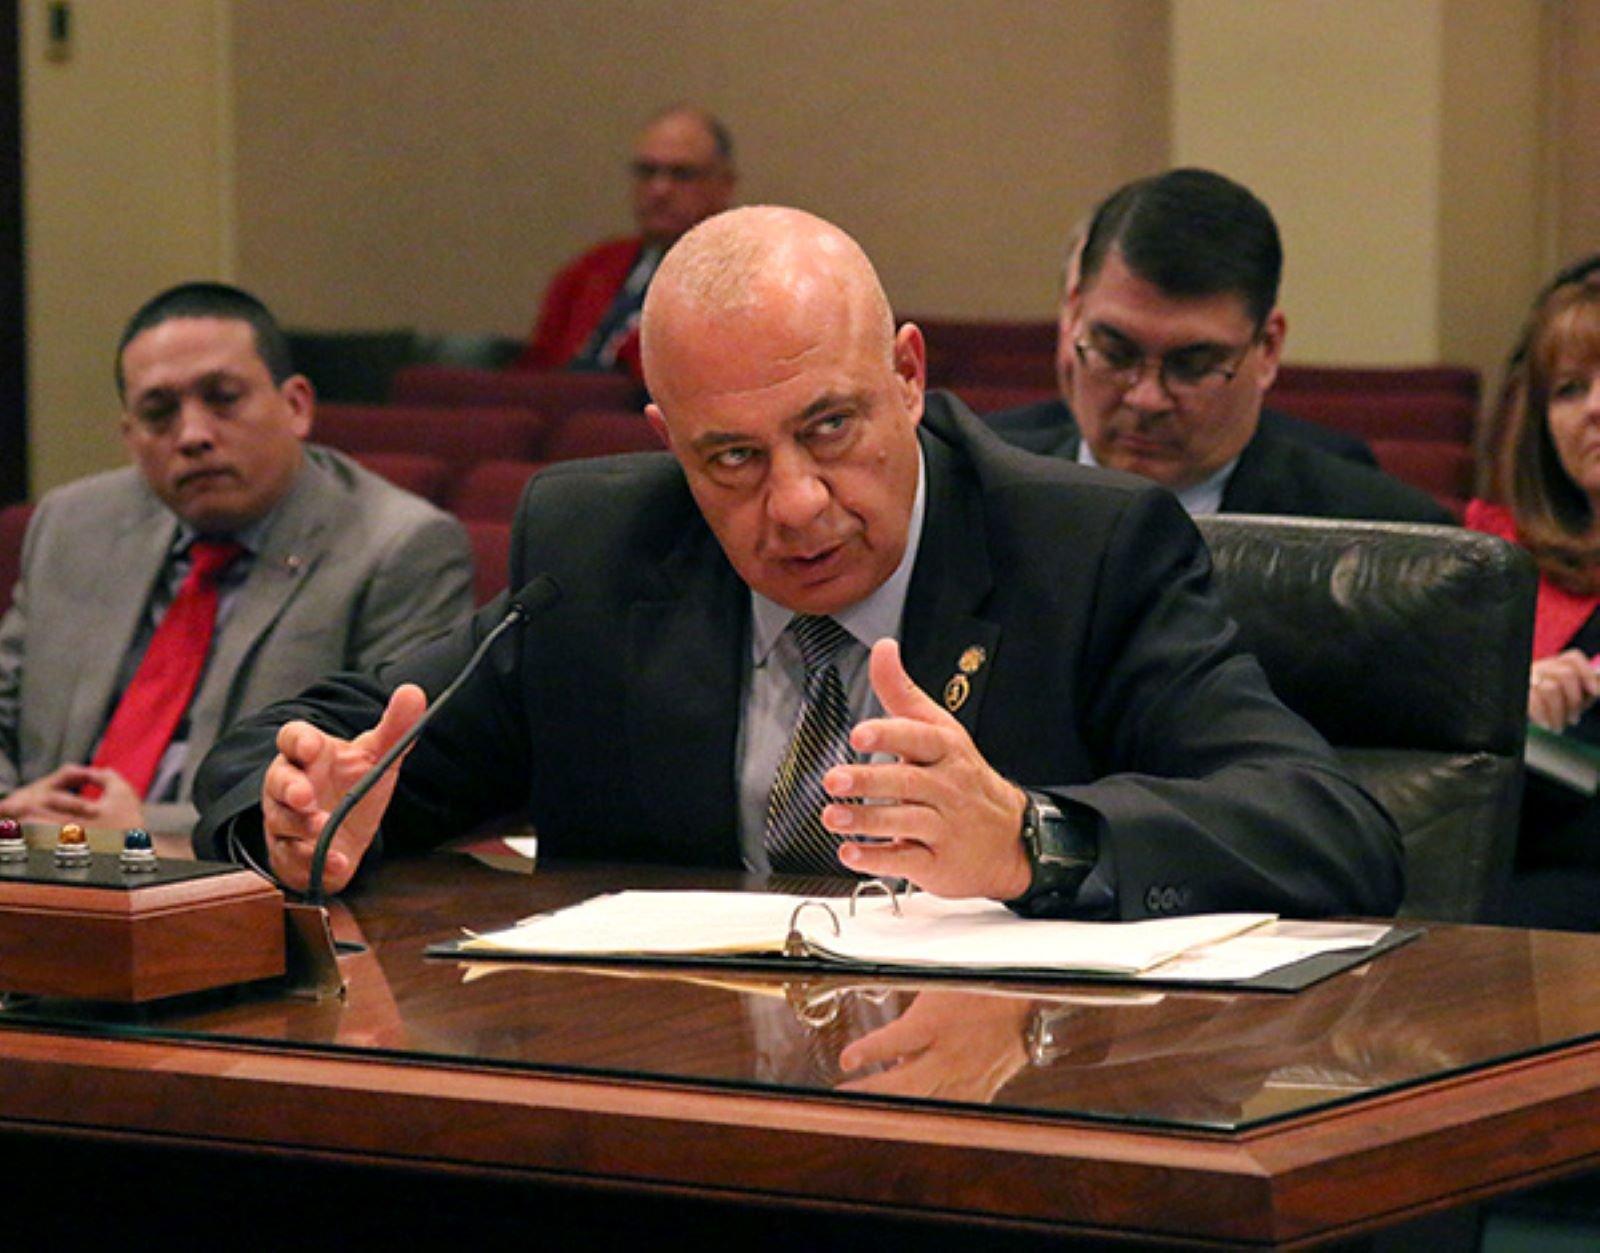 Nebraska state senator says rare leukemia has returned